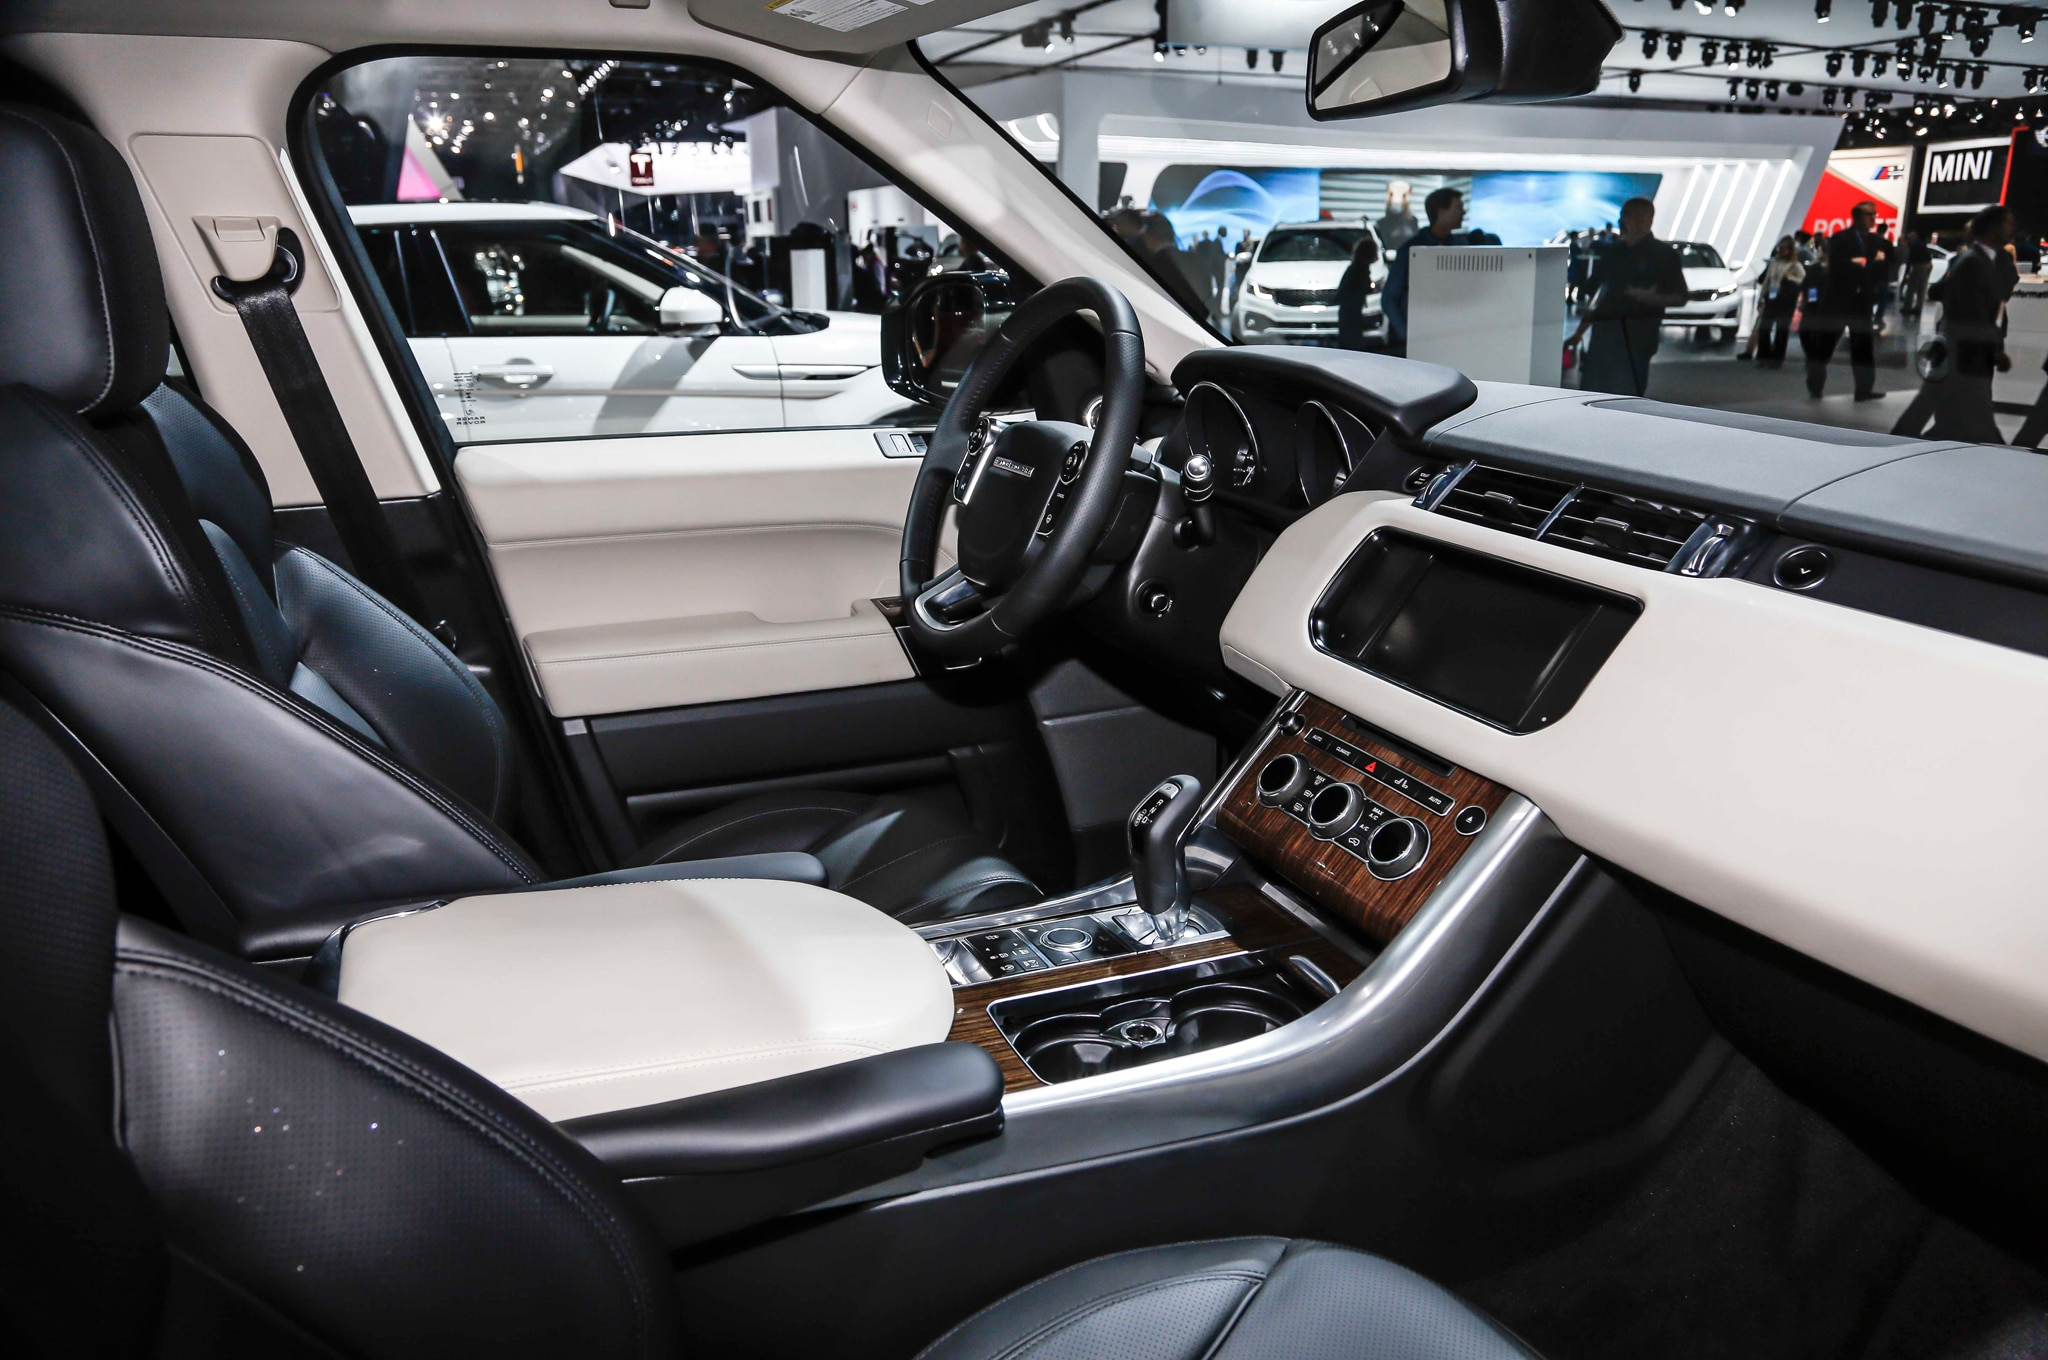 http://st.automobilemag.com/uploads/sites/10/2015/09/2016-Land-Rover-Range-Rover-Sport-HSE-TD6-interior-02.jpg